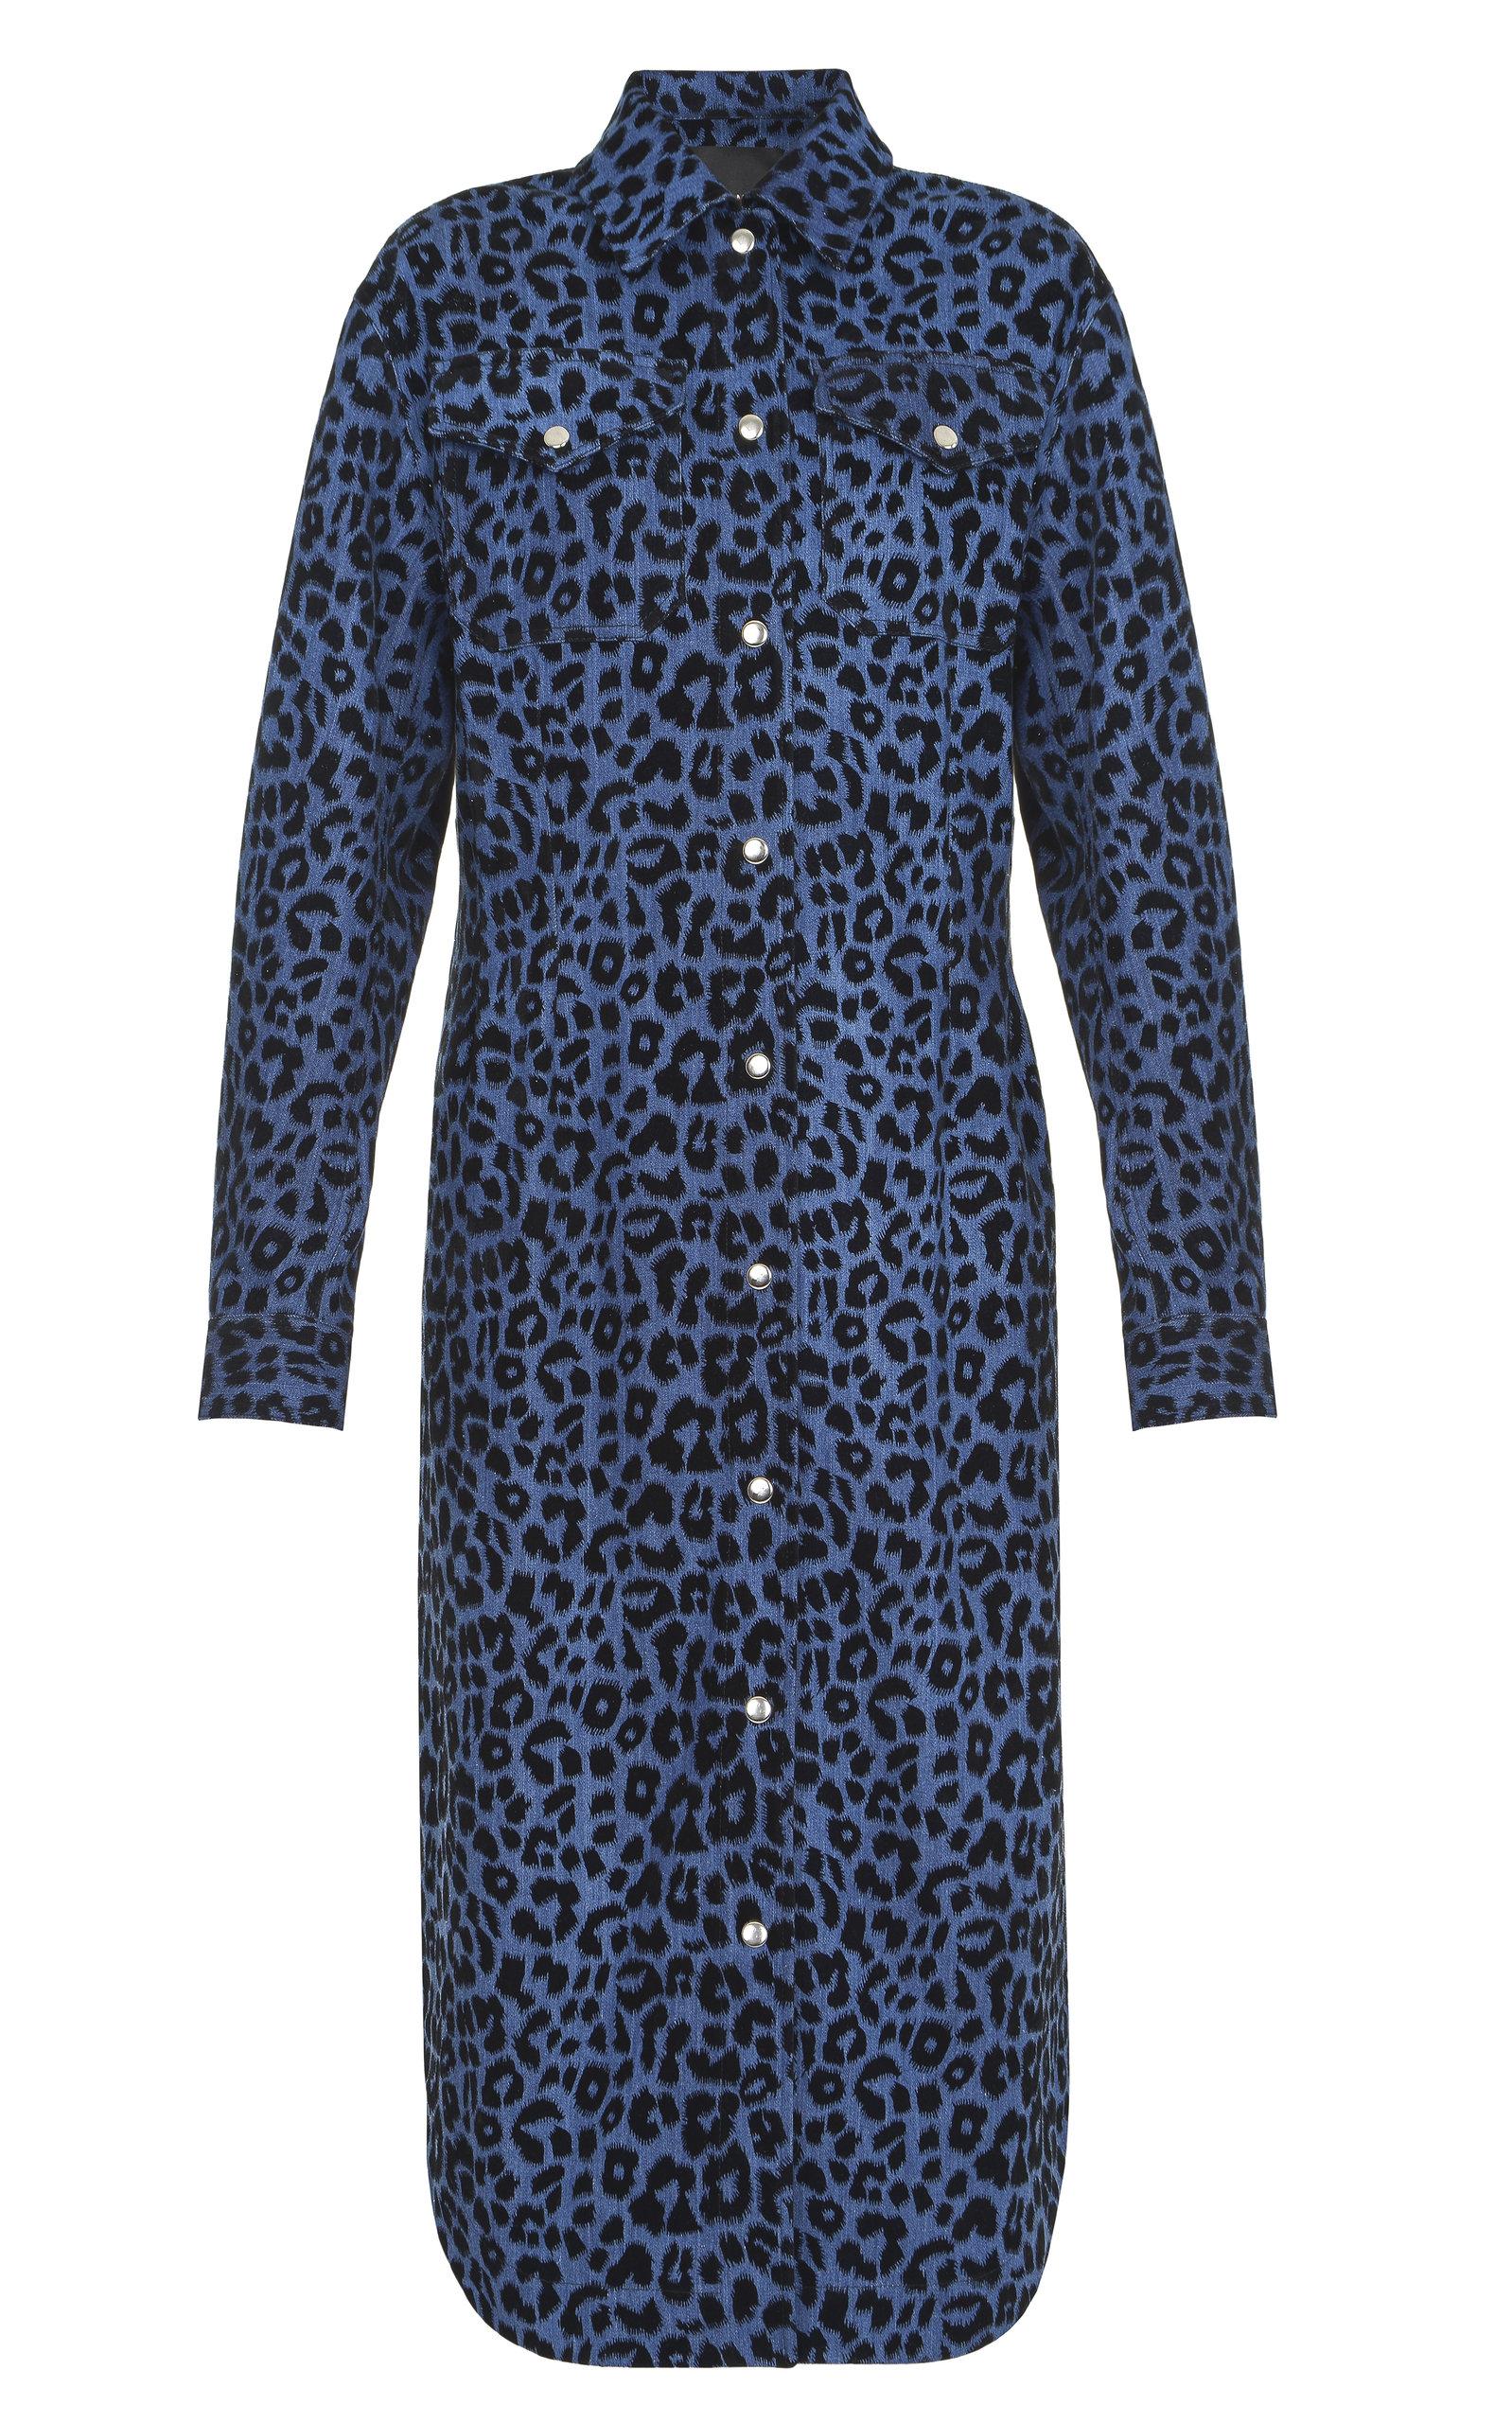 Women's Leopard Printed Cotton-Blend Longline Jacket